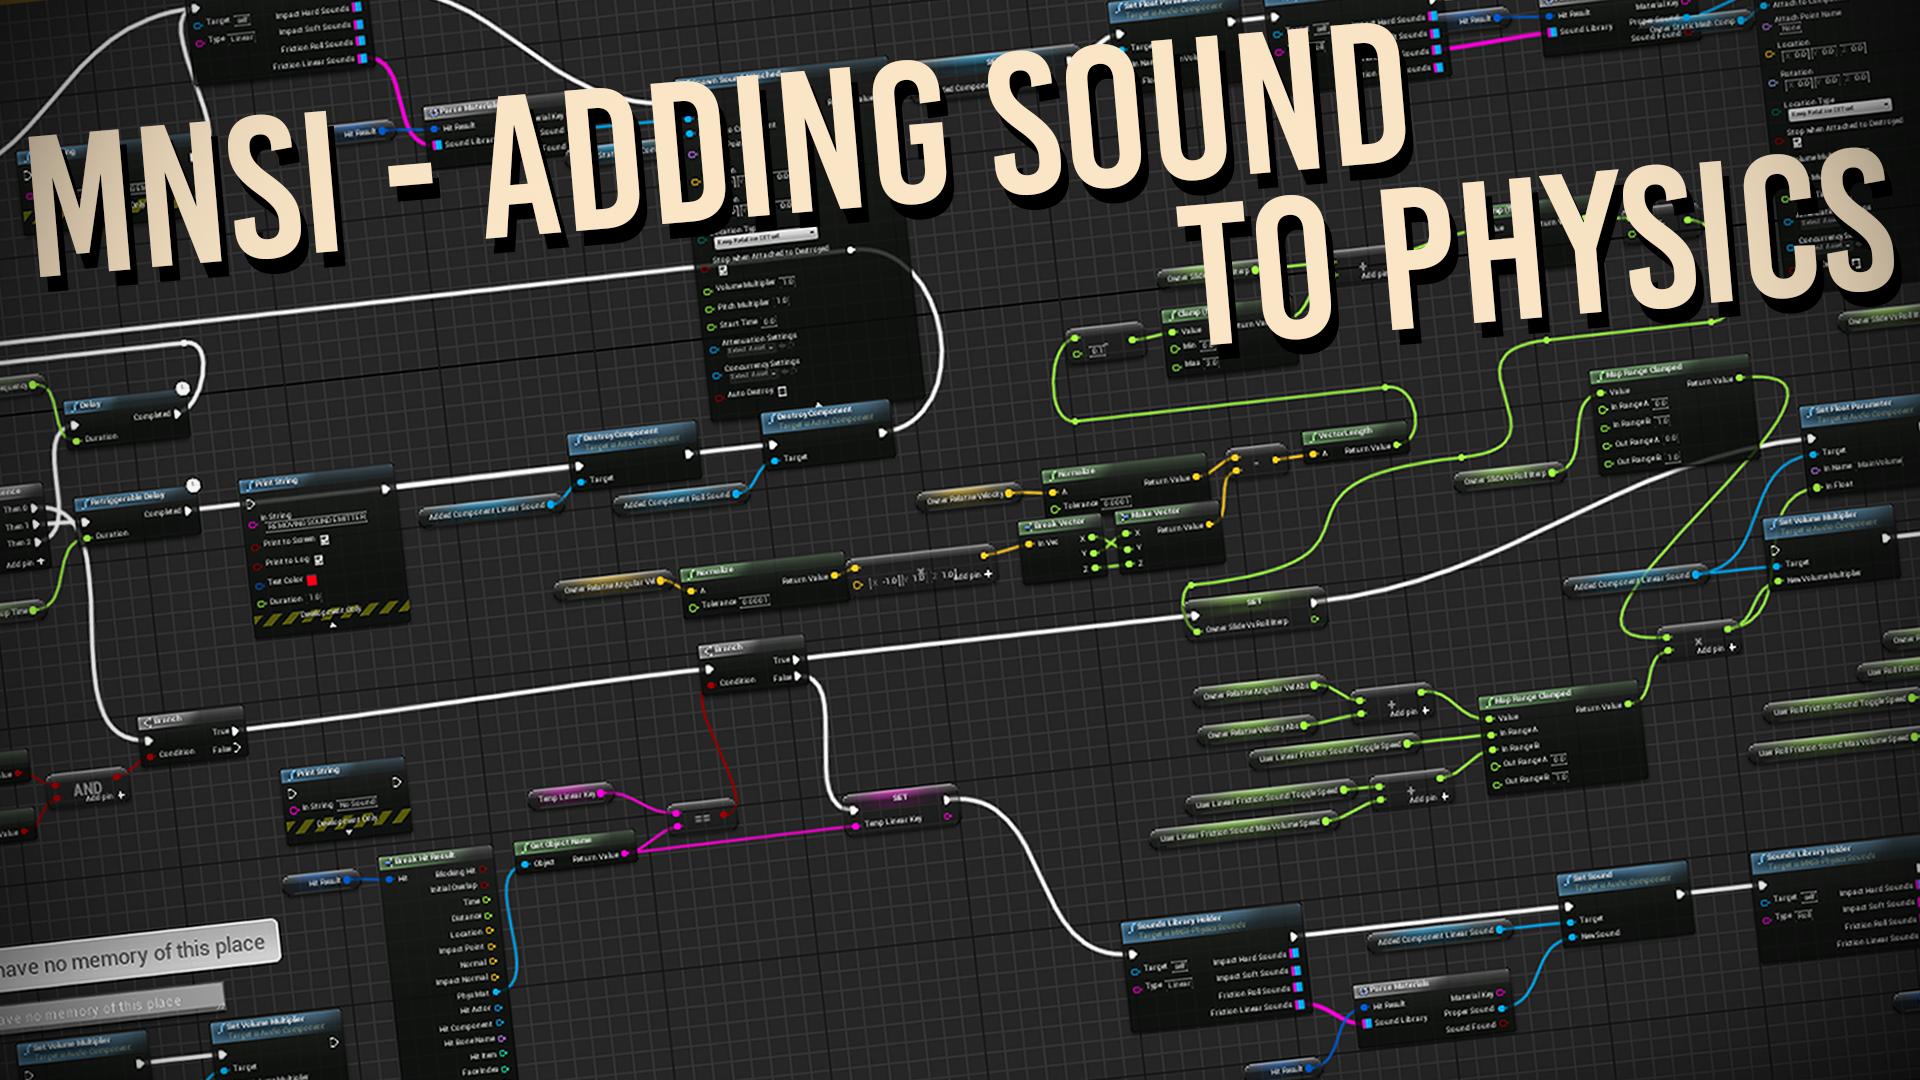 MNSI - Adding Sound To Physics by Anton Antonov in Blueprints - UE4